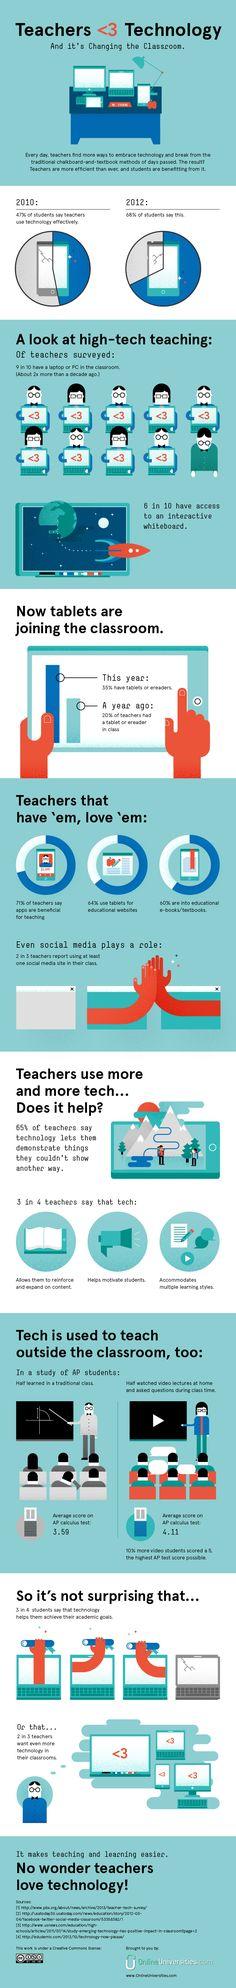 Teacher's Love For Technology is Changing Classrooms #edtech #infographic #teachers #educators #techinclassroom #edchat